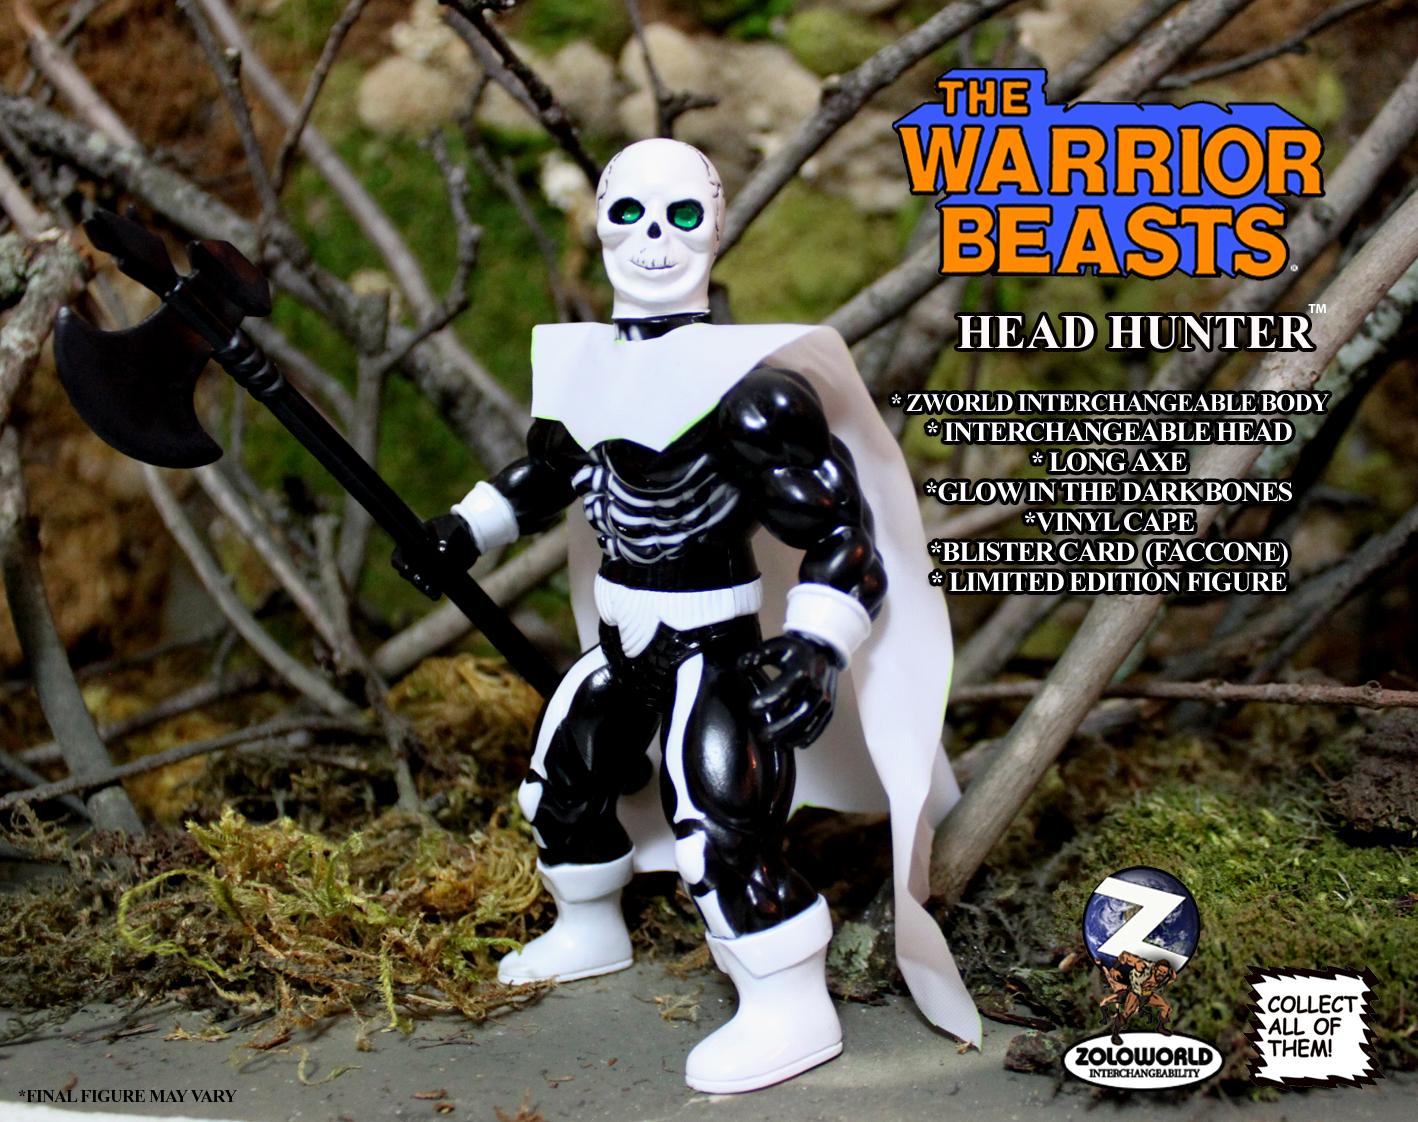 The Warrior Beasts: HEAD HUNTER by Zoloworld